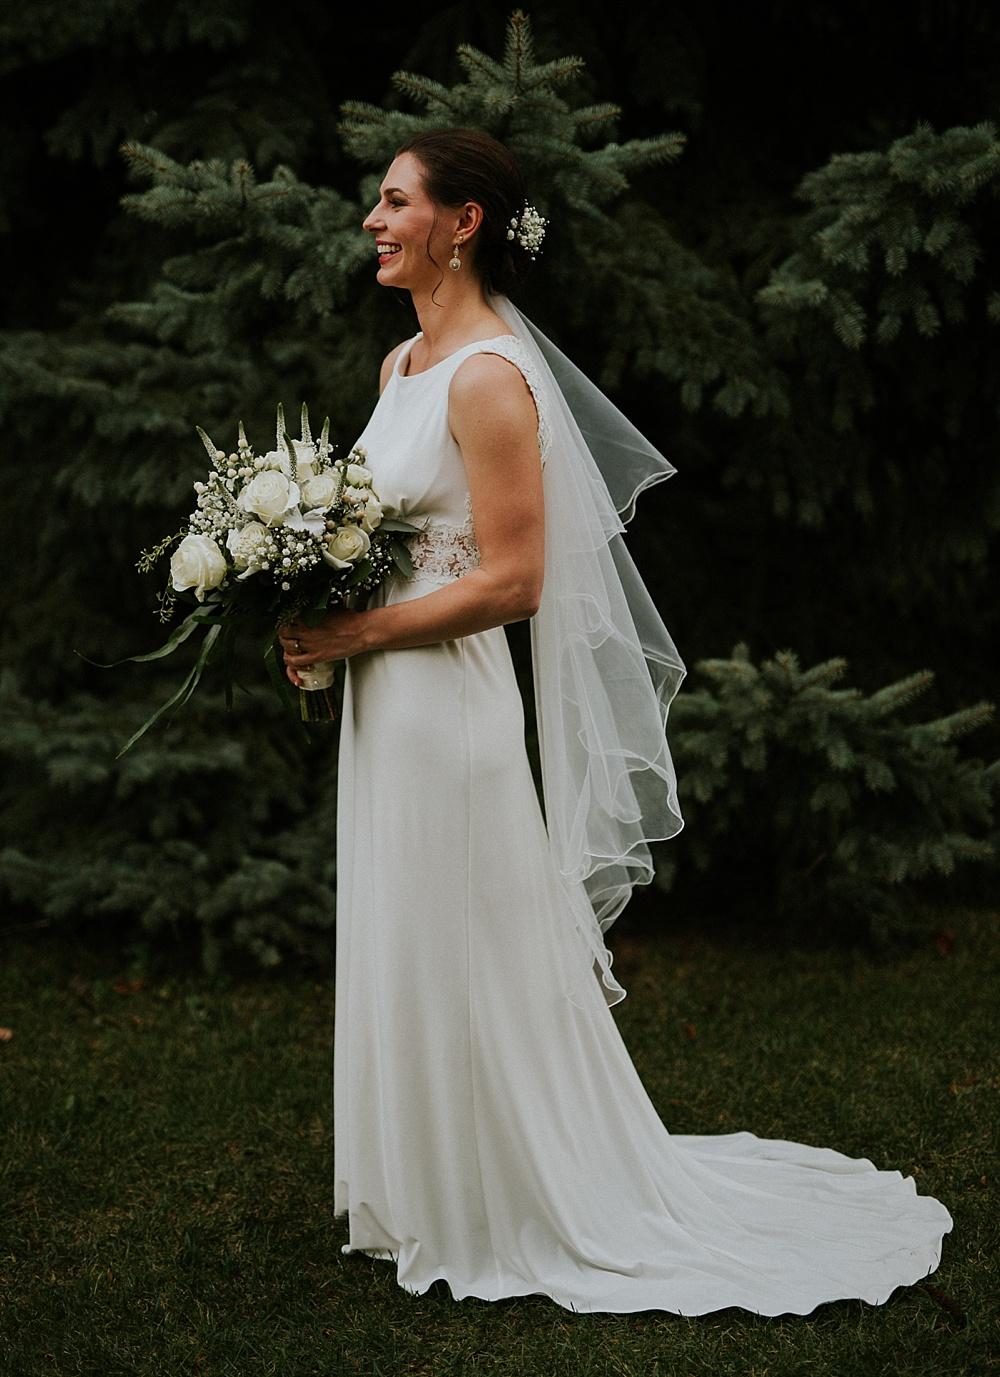 Mike-Stephanie_chicago_wedding_liller-photo-00017.jpg